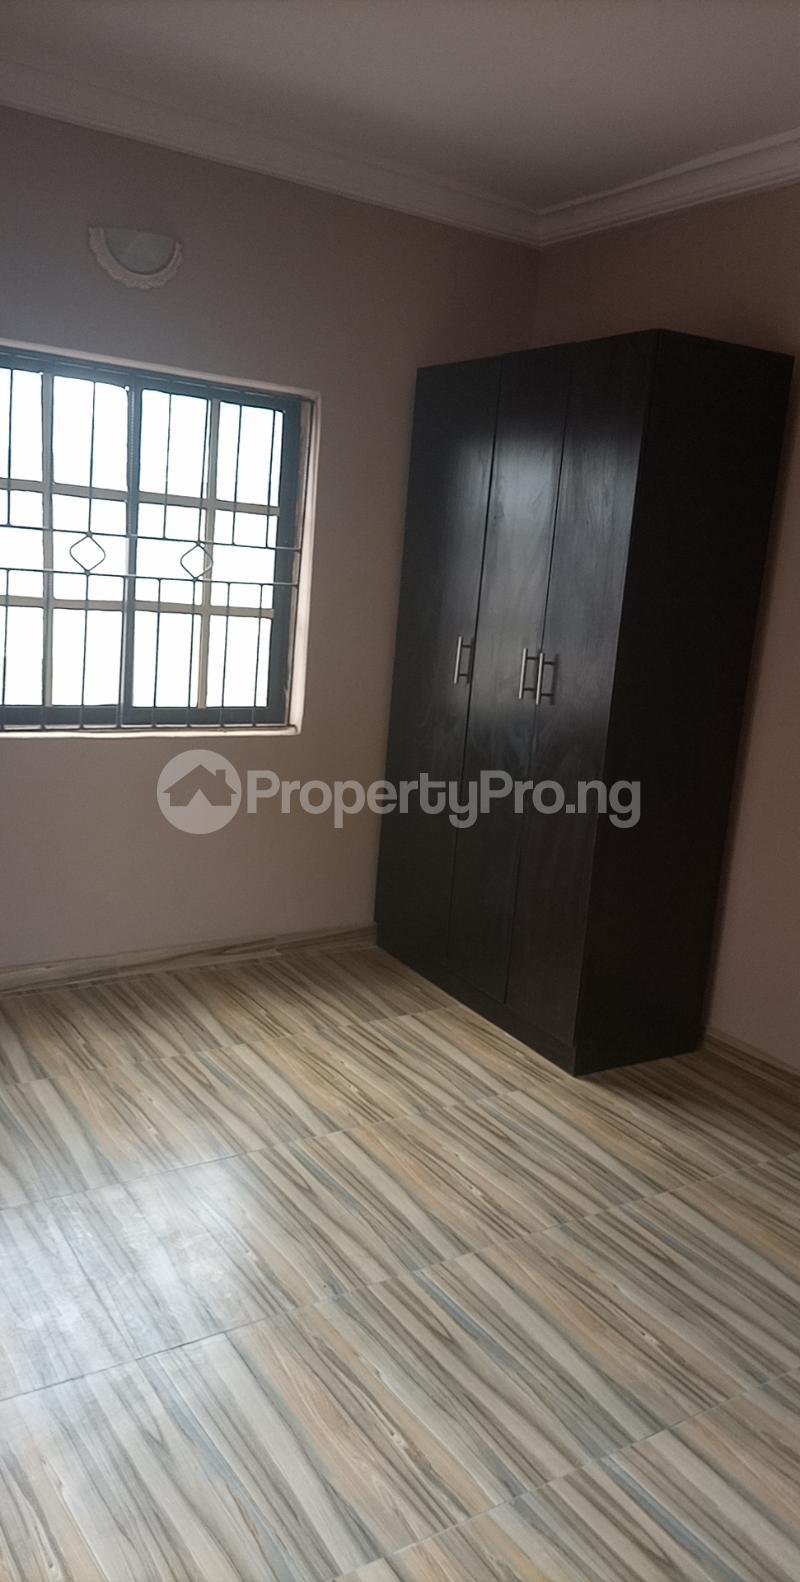 5 bedroom Detached Duplex House for sale Ajao Estate Isolo. Lagos Mainland Ajao Estate Isolo Lagos - 0